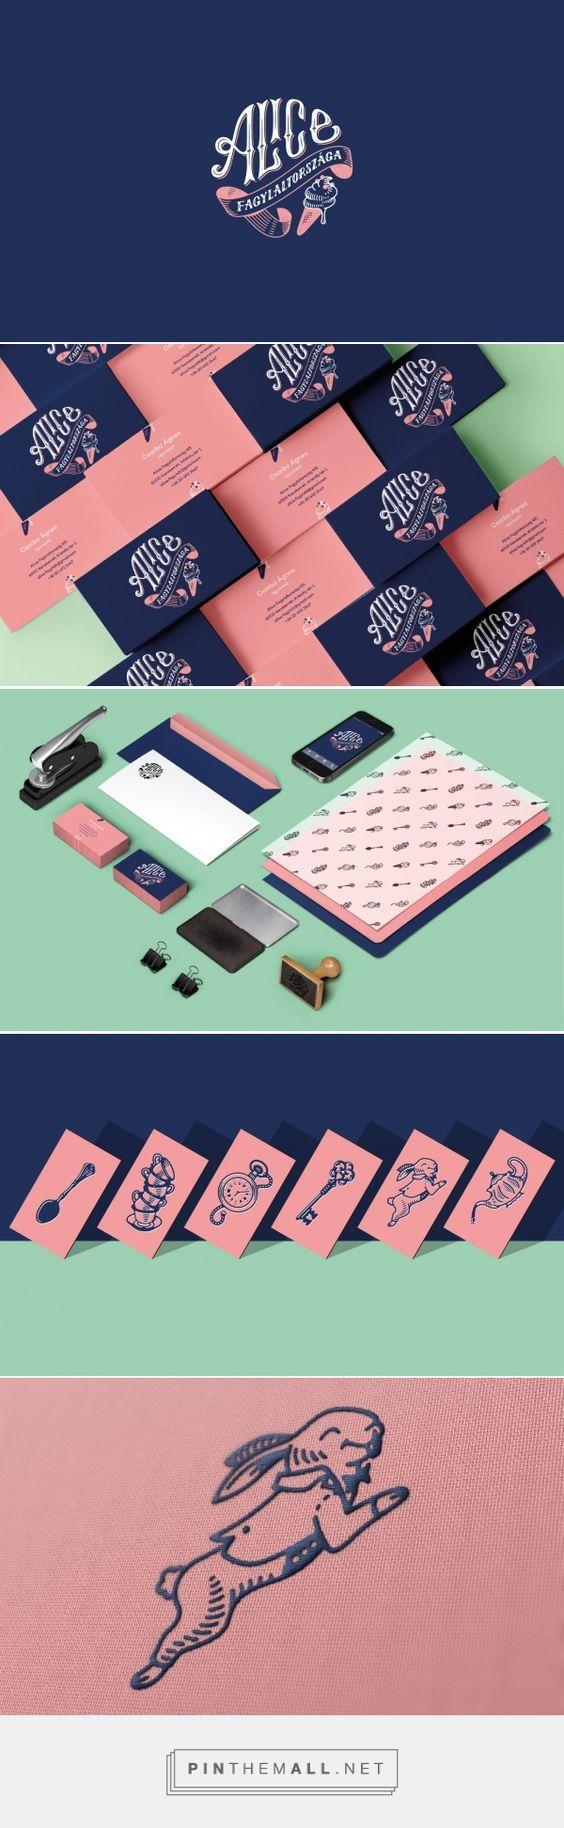 Alice Branding by Dori Novotny | Fivestar Branding – Design and Branding Agency & Inspiration Gallery: